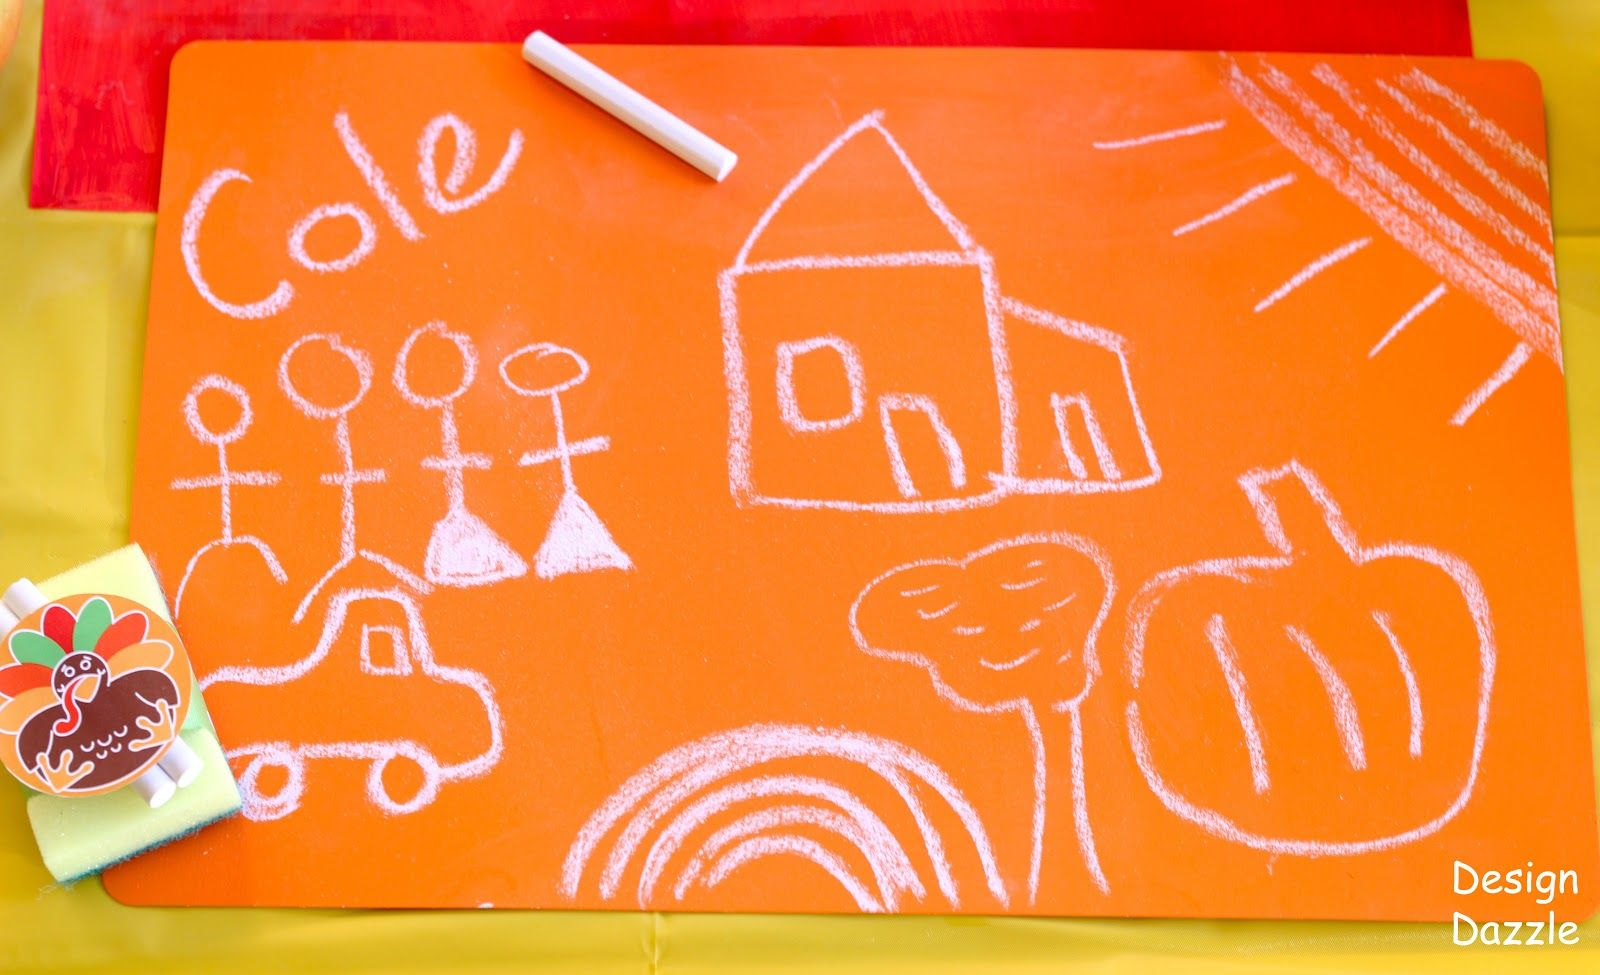 Diy Chalkboard Paint Contact Paper Placemats Design Dazzle Diy Chalkboard Paint Thanksgiving Kids Table Decorations Diy Placemats